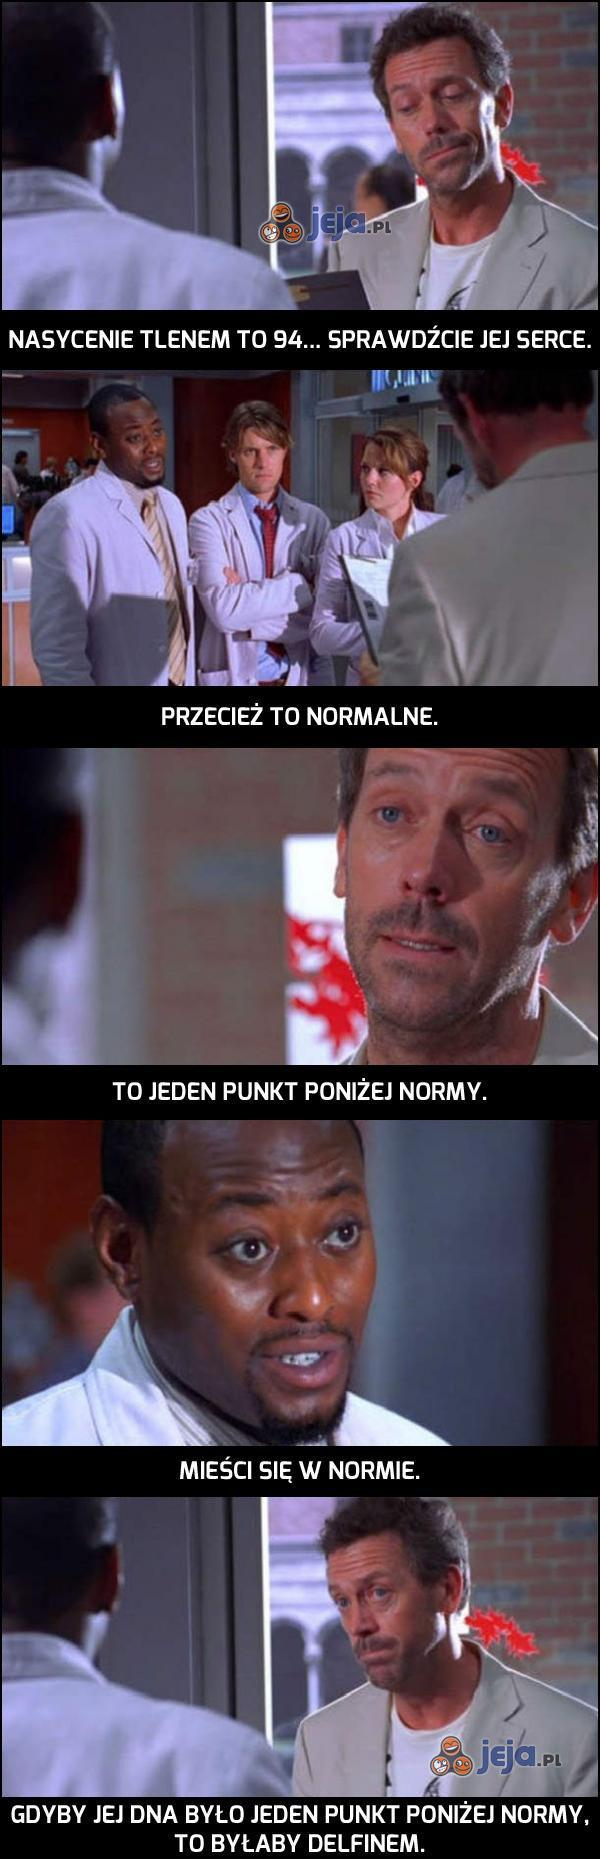 Cięty język dr. Housa